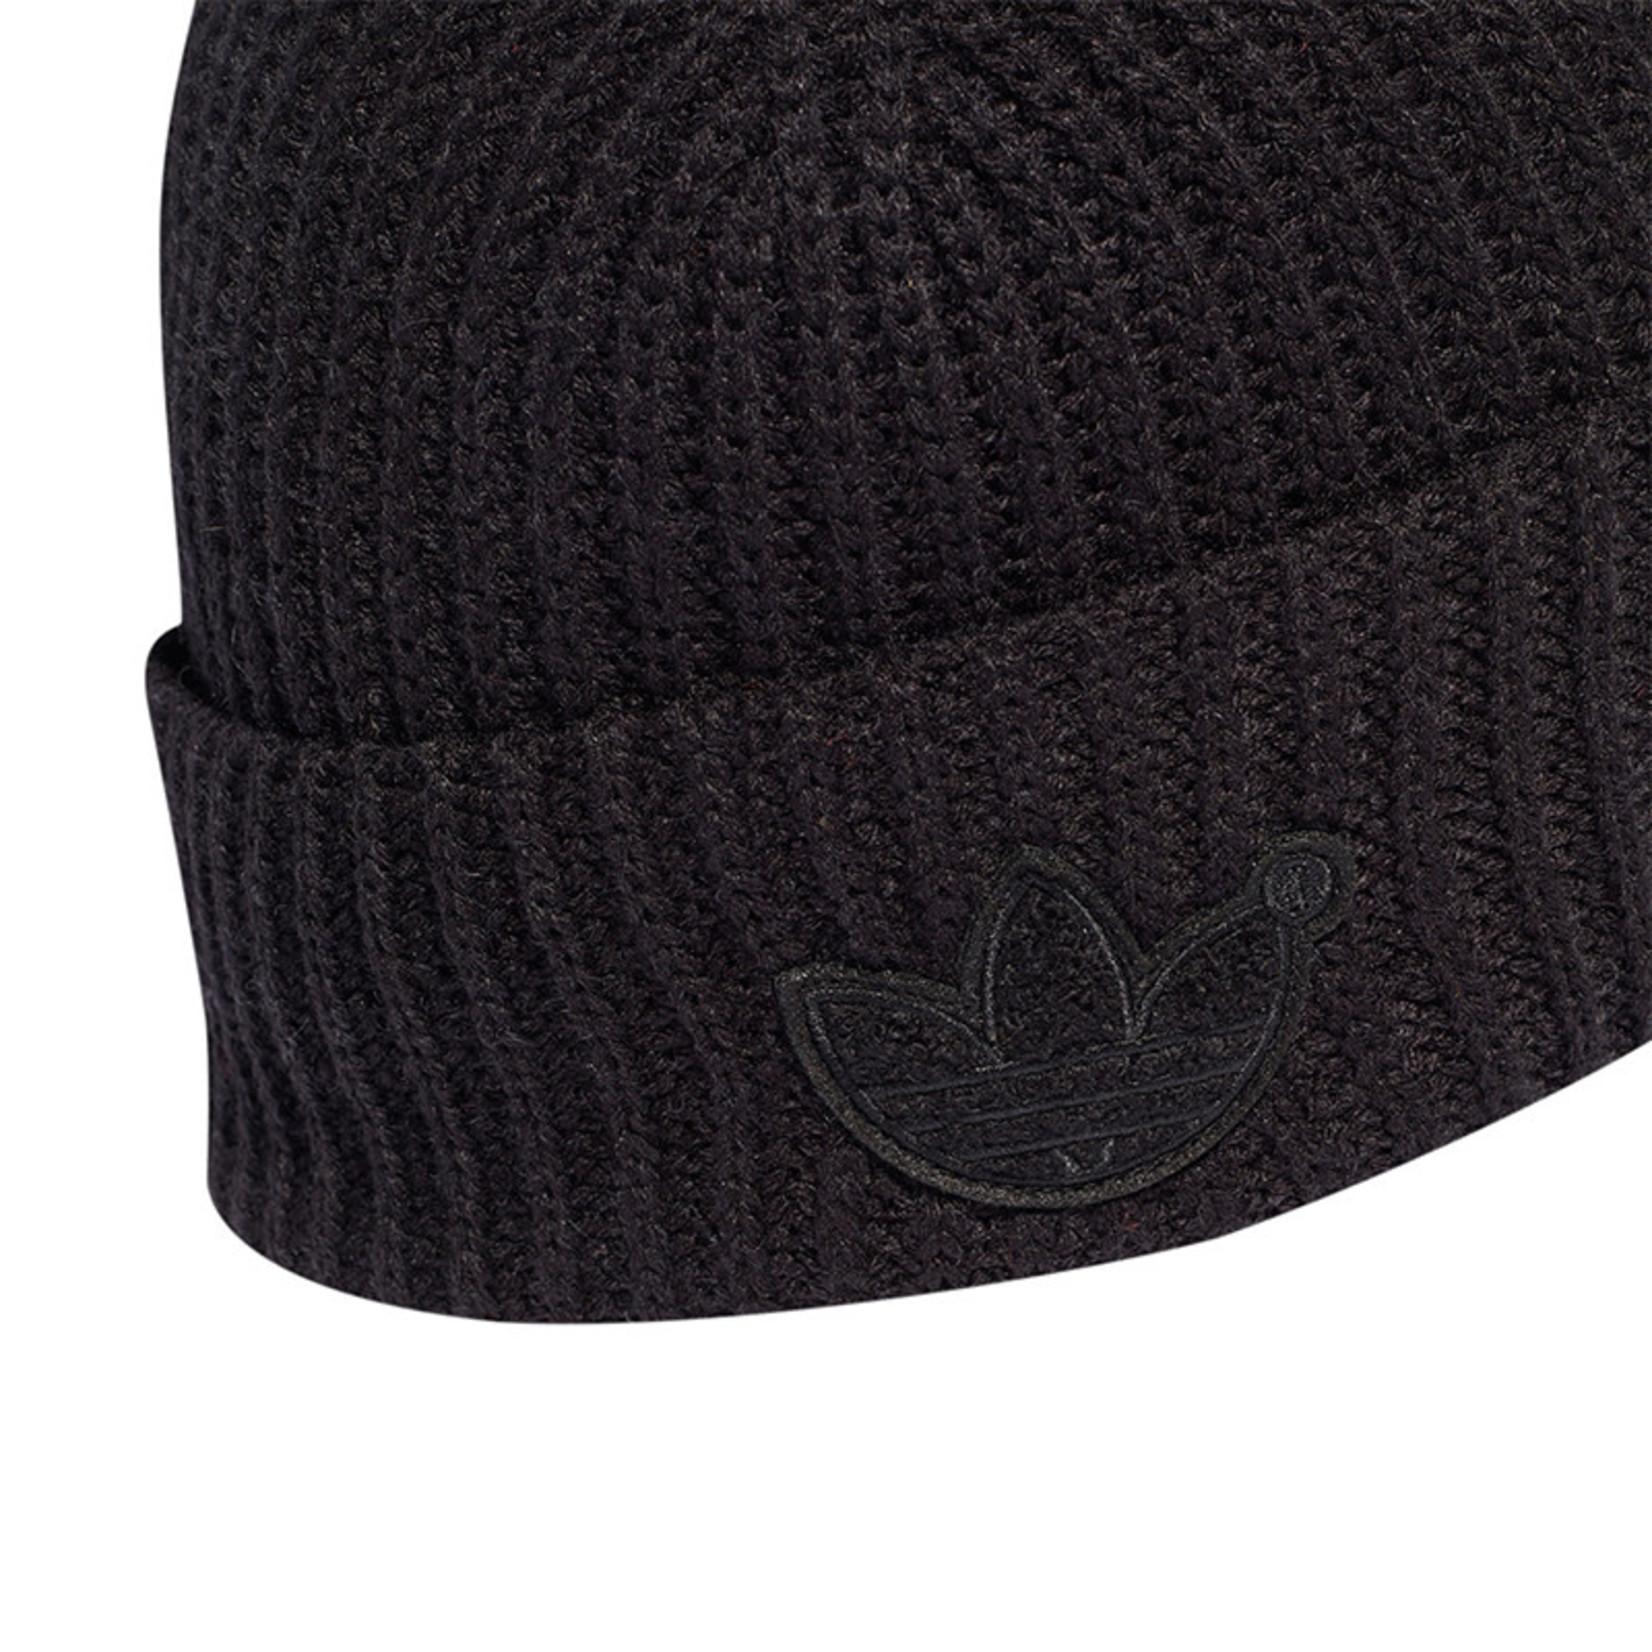 Adidas Adidas : Tone On Tone Logo Beanie